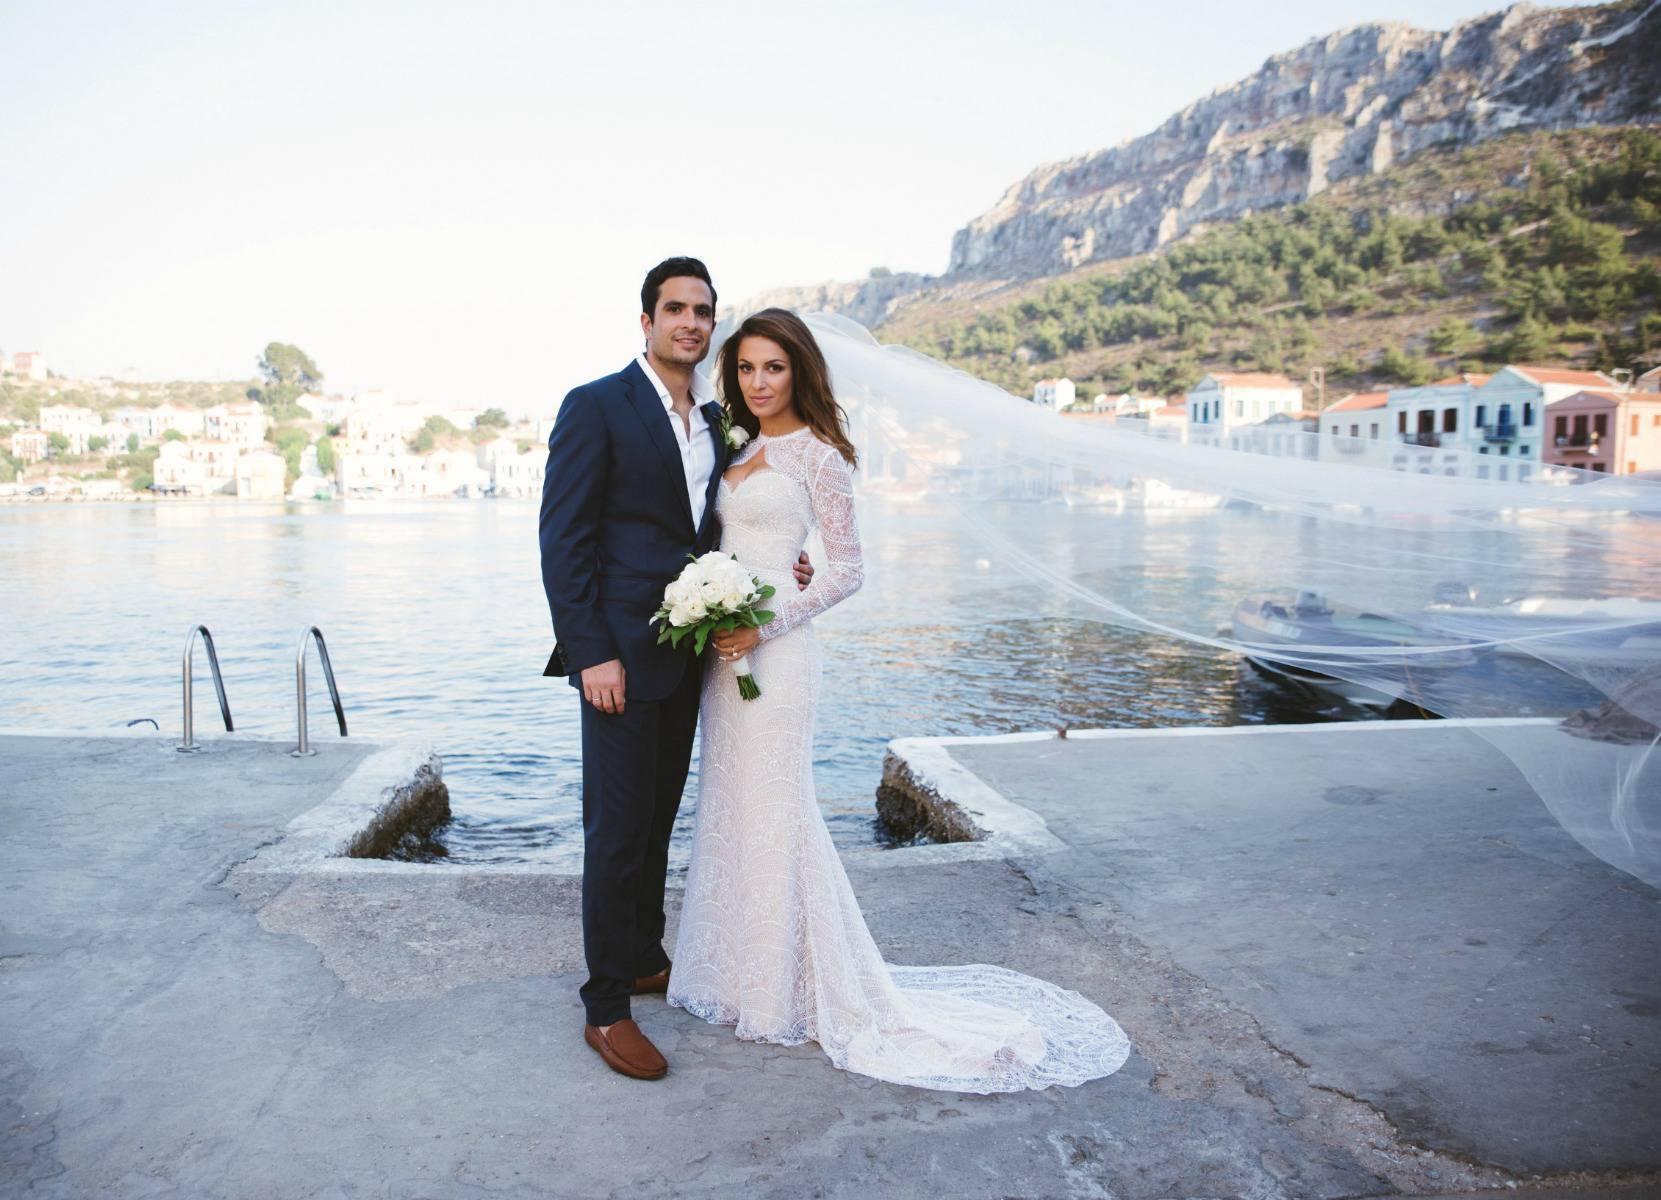 Demosthenes & Elle Kastellorizo Picturesque Nifties Bay Greece Wedding